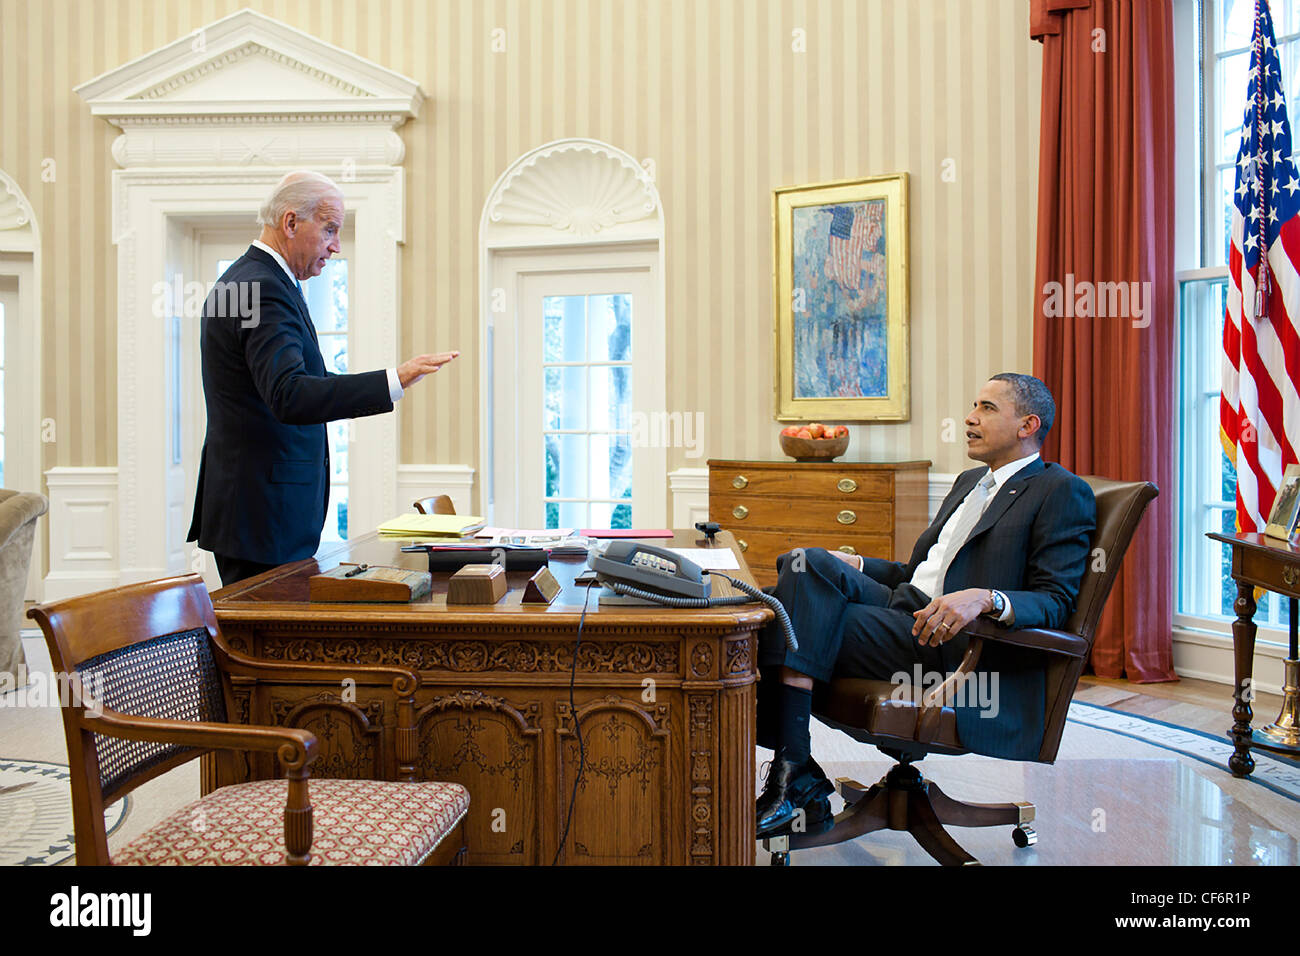 Präsident Barack Obama spricht mit Vize-Präsident Joe Biden im Oval Office 14. März 2011 in Washington, Stockbild